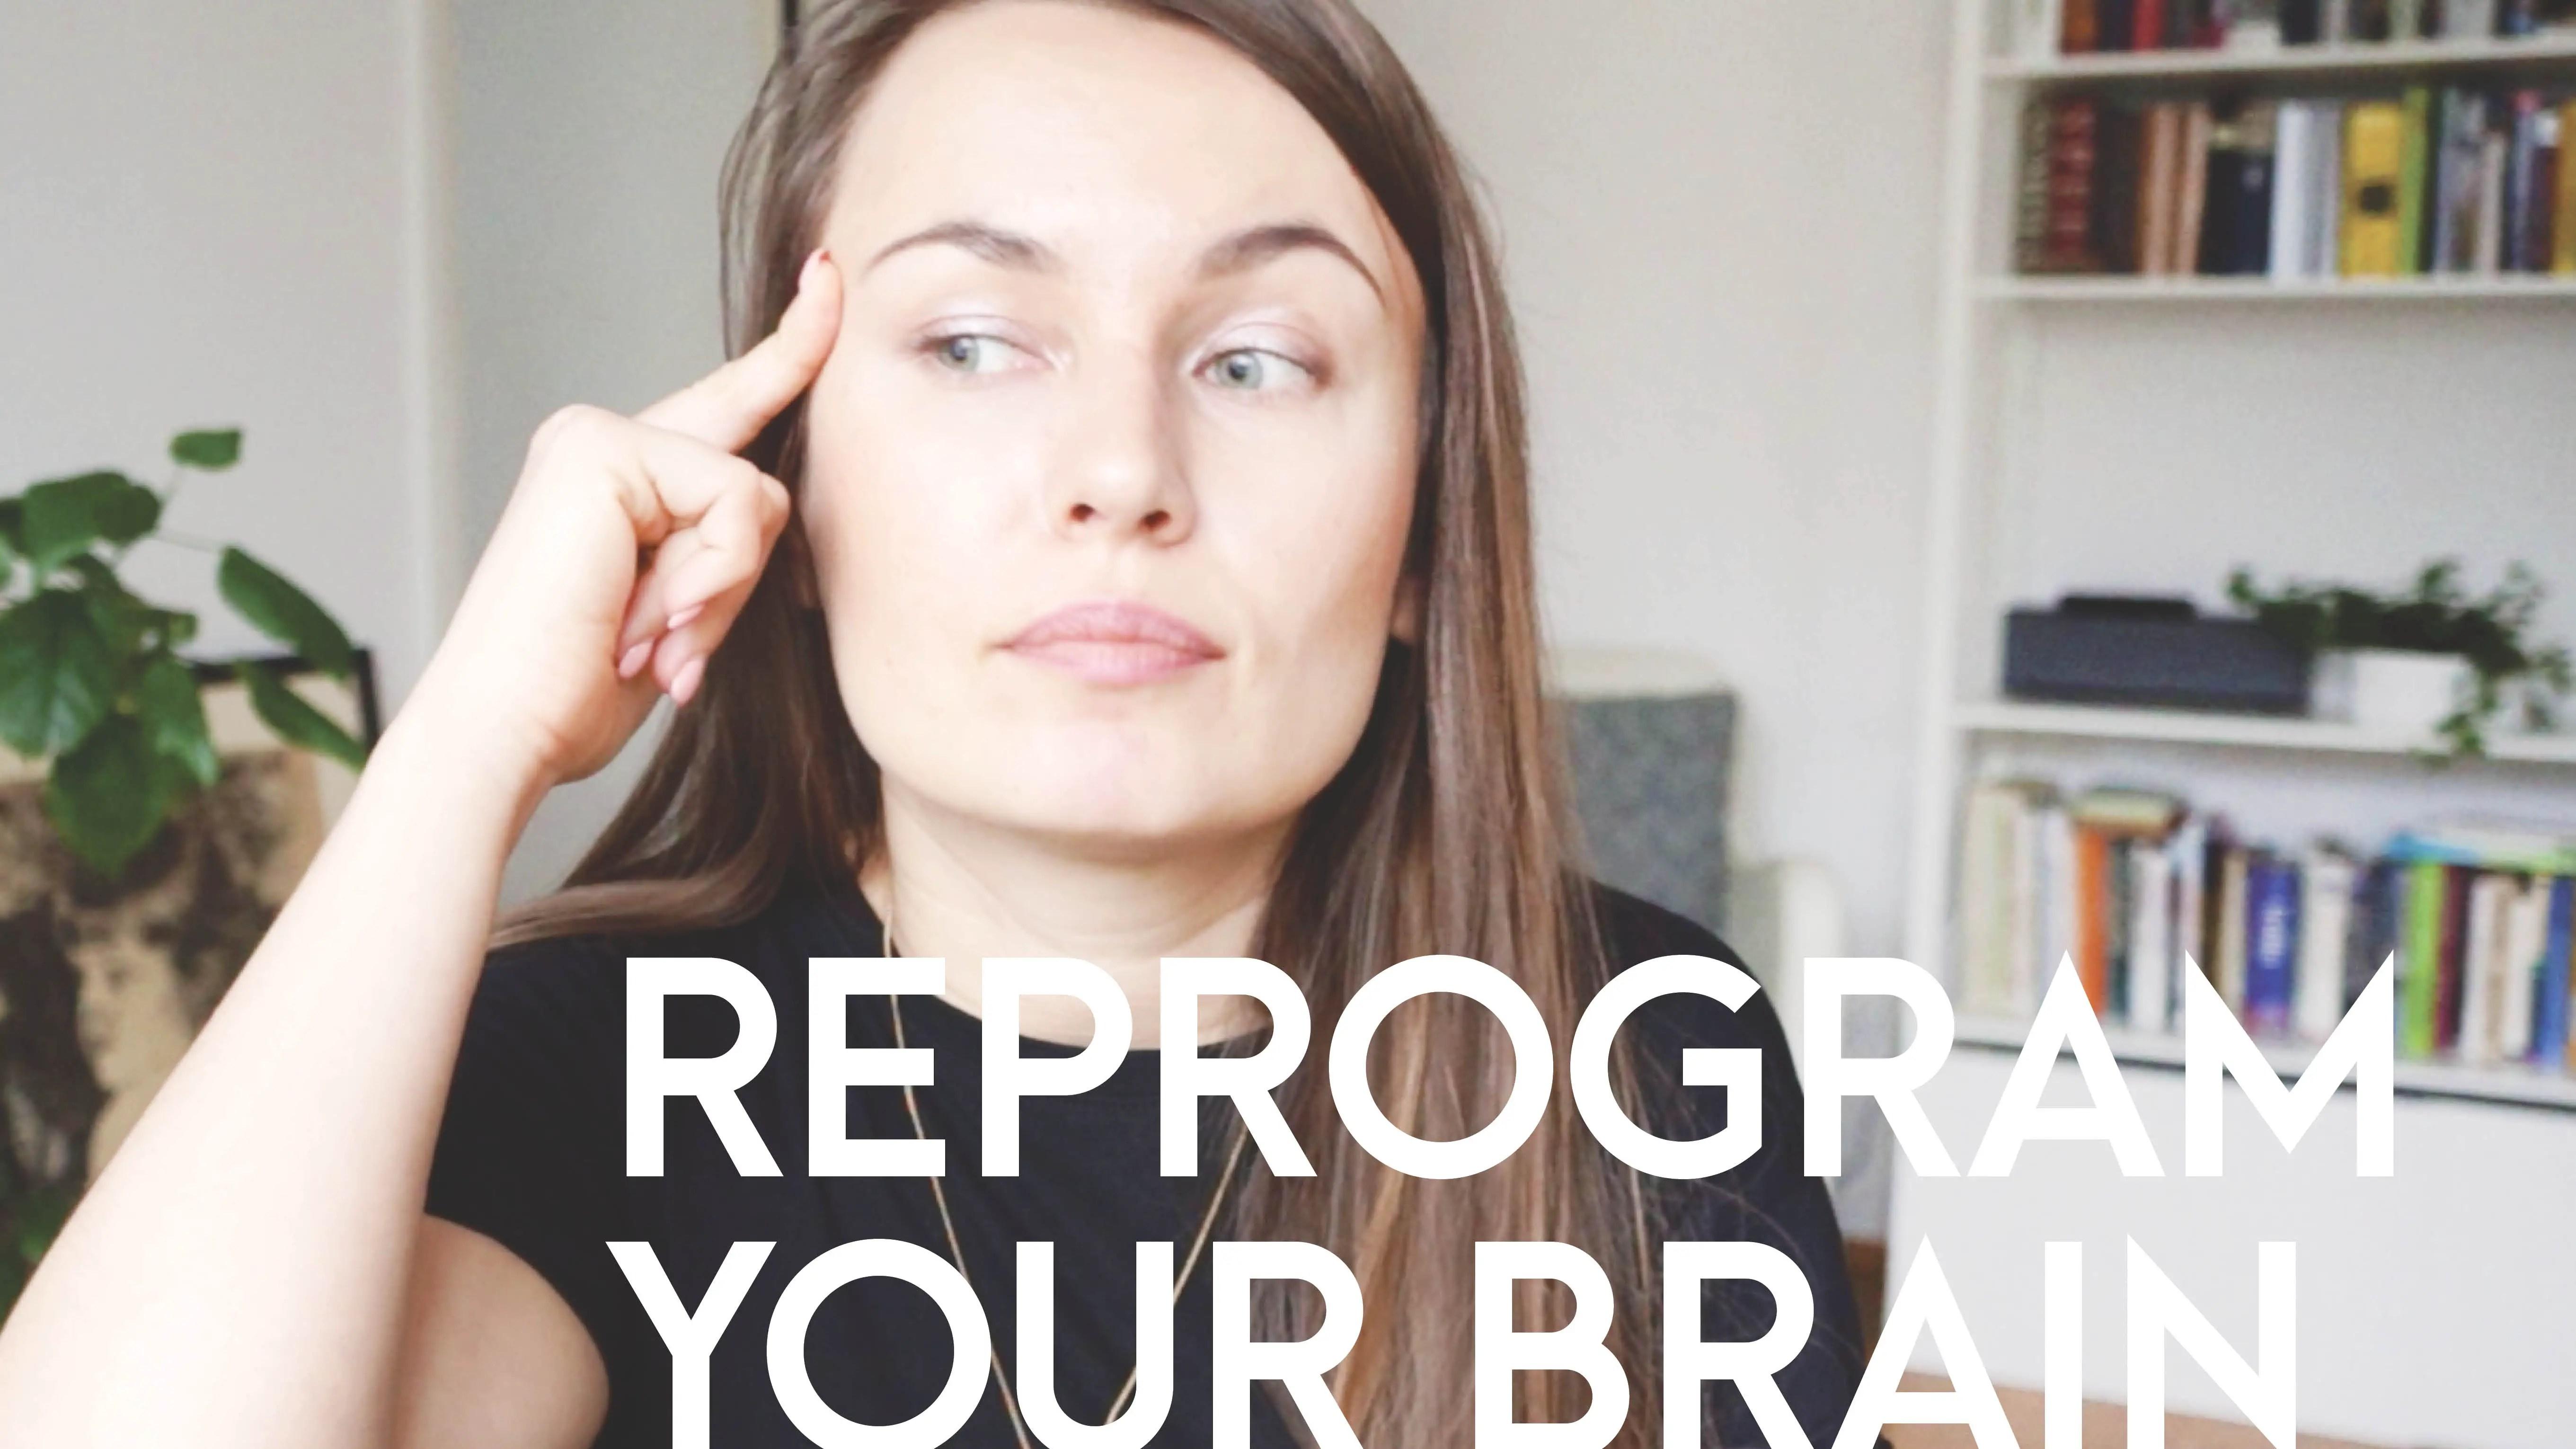 reprogram your brain